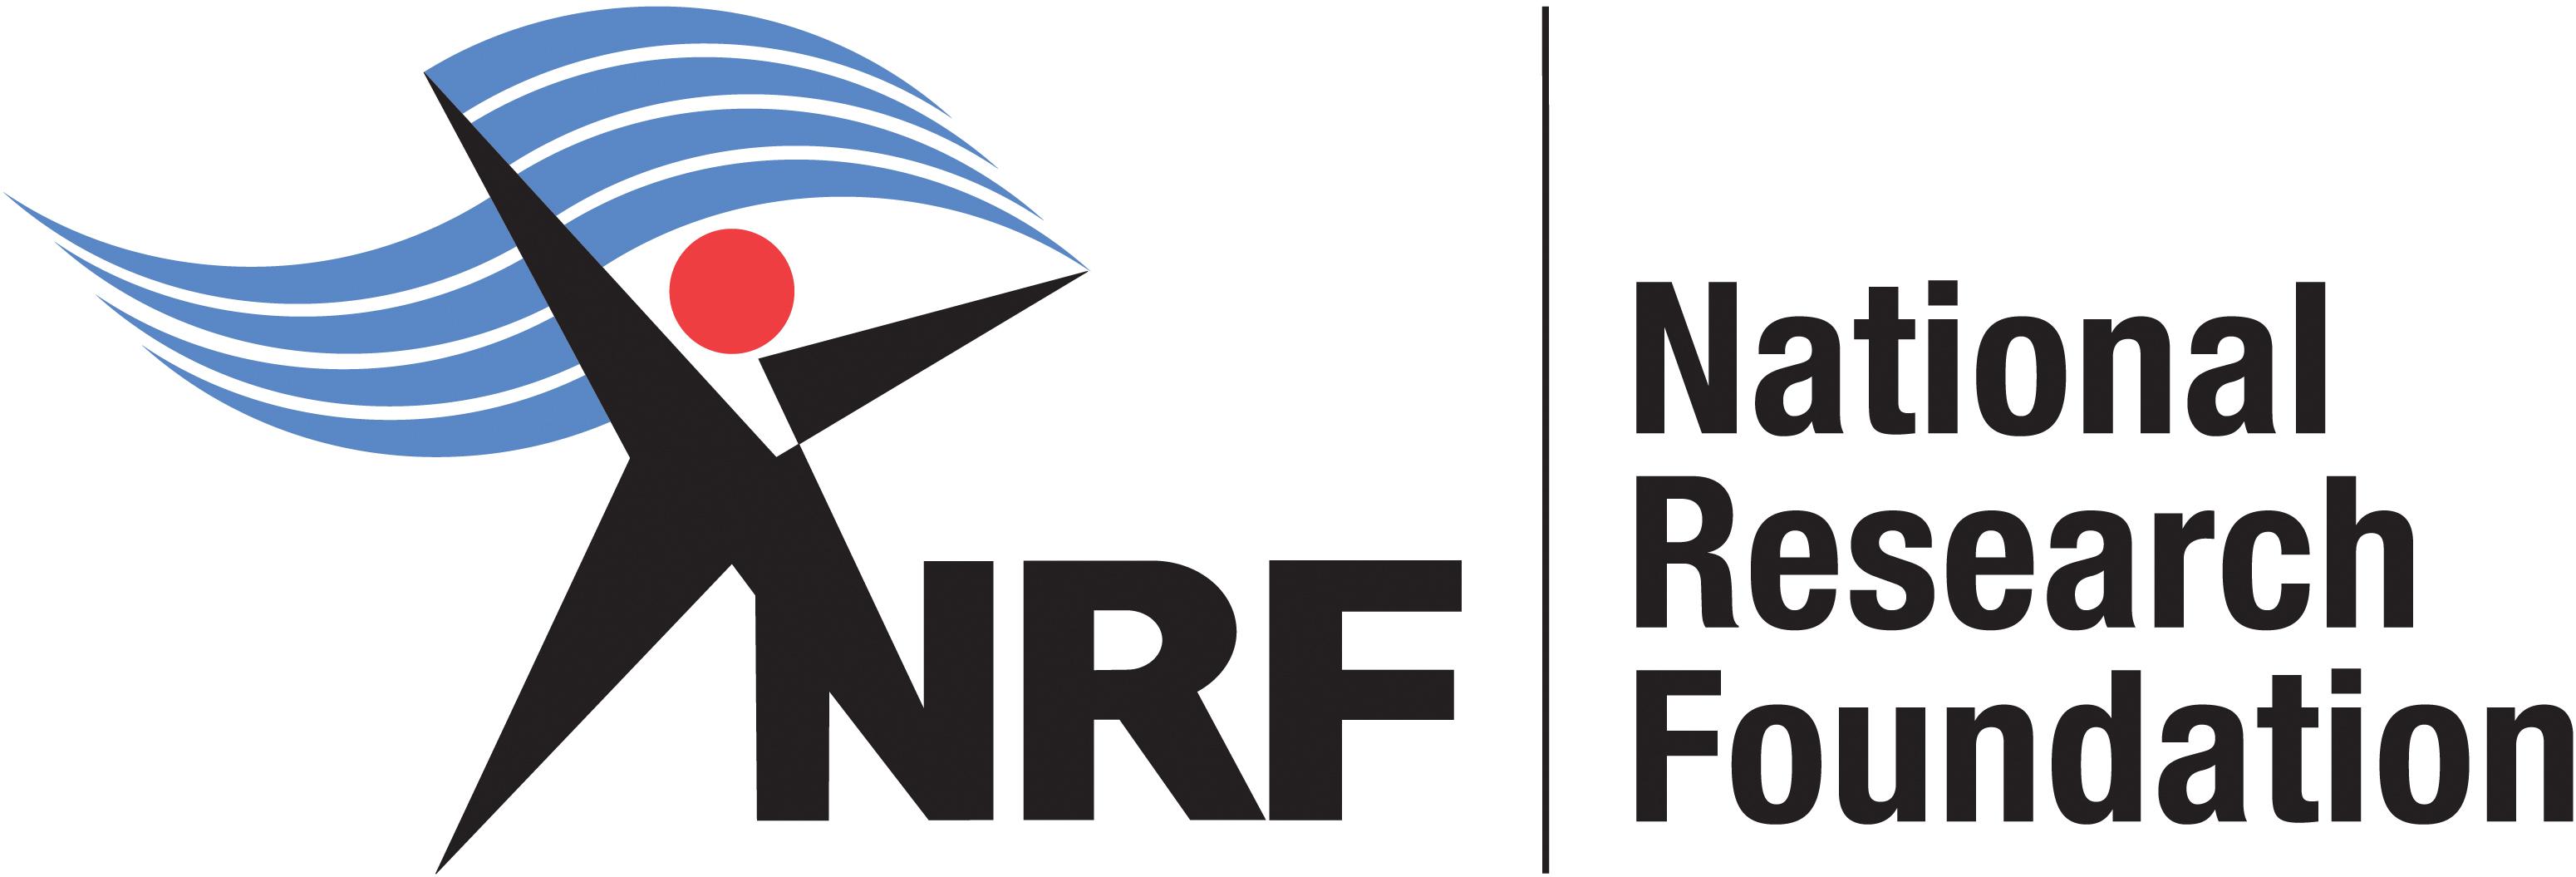 Sephetho sa setšoantšo sa National Research Foundation Bursary South Africa 2017 – 2018